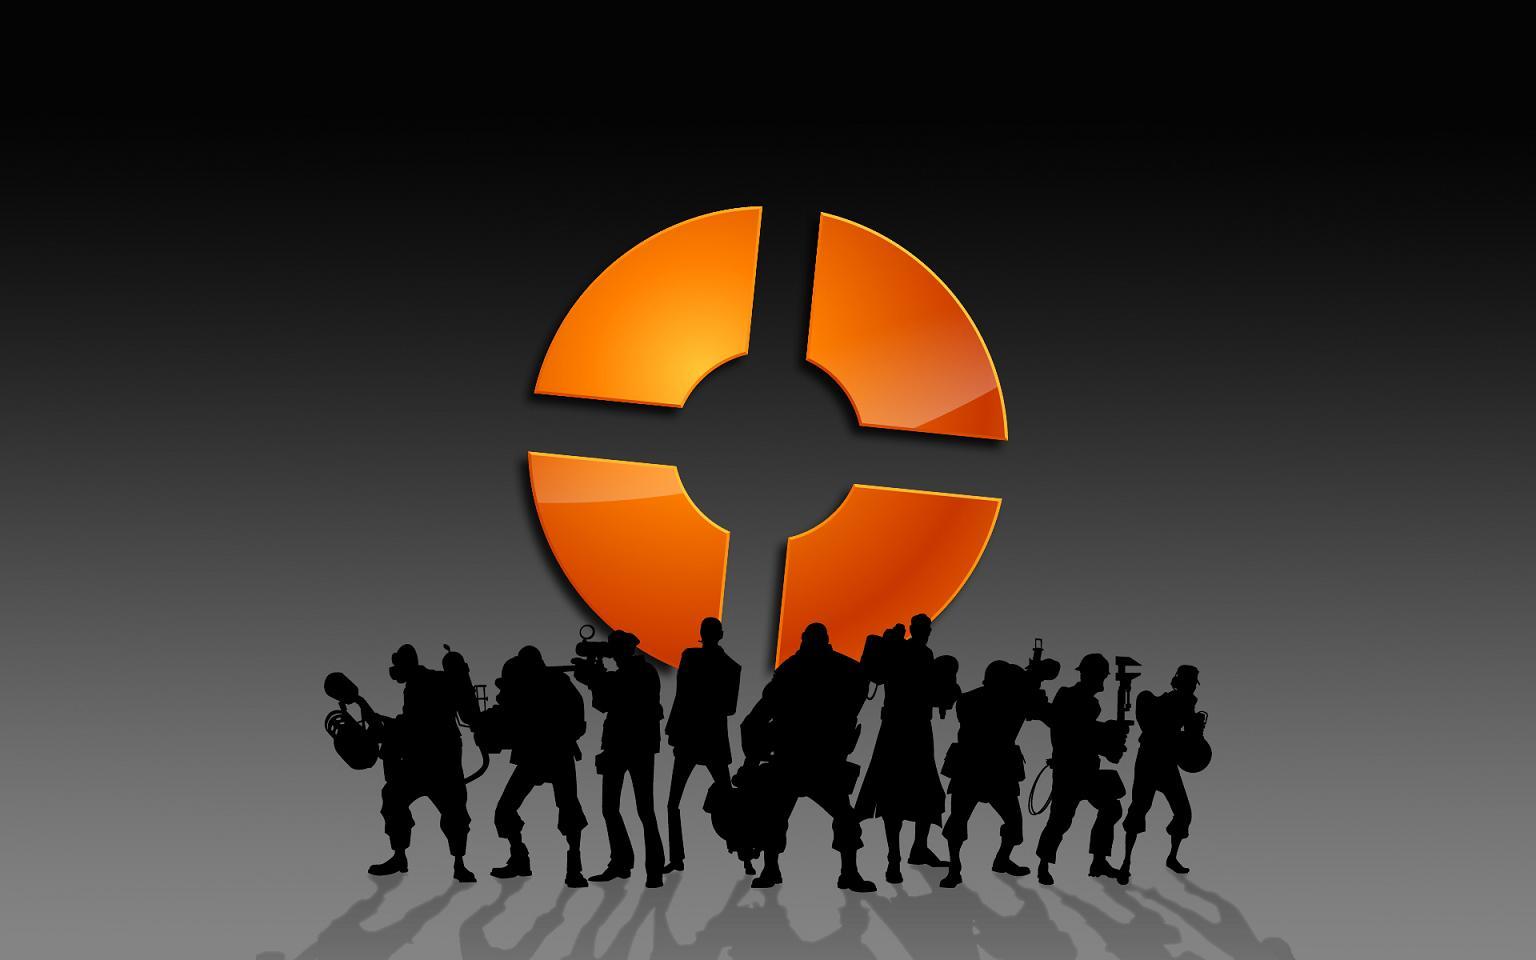 Team Fortress 2 Screensaver